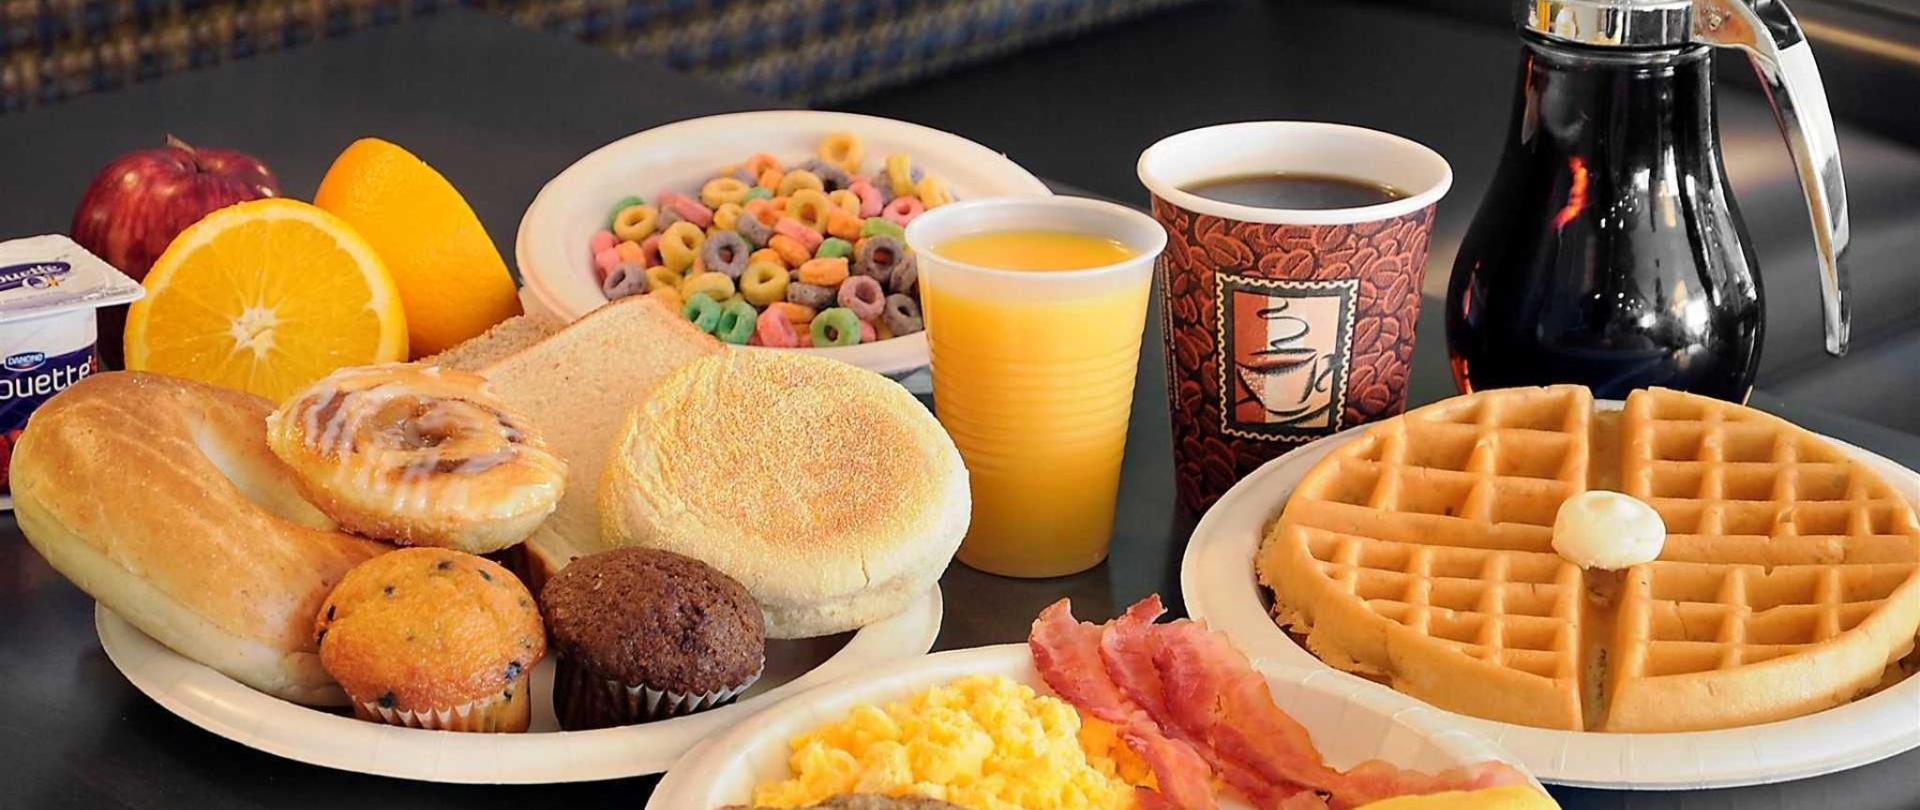 hot-breakfast-large.jpg.1920x0.jpg